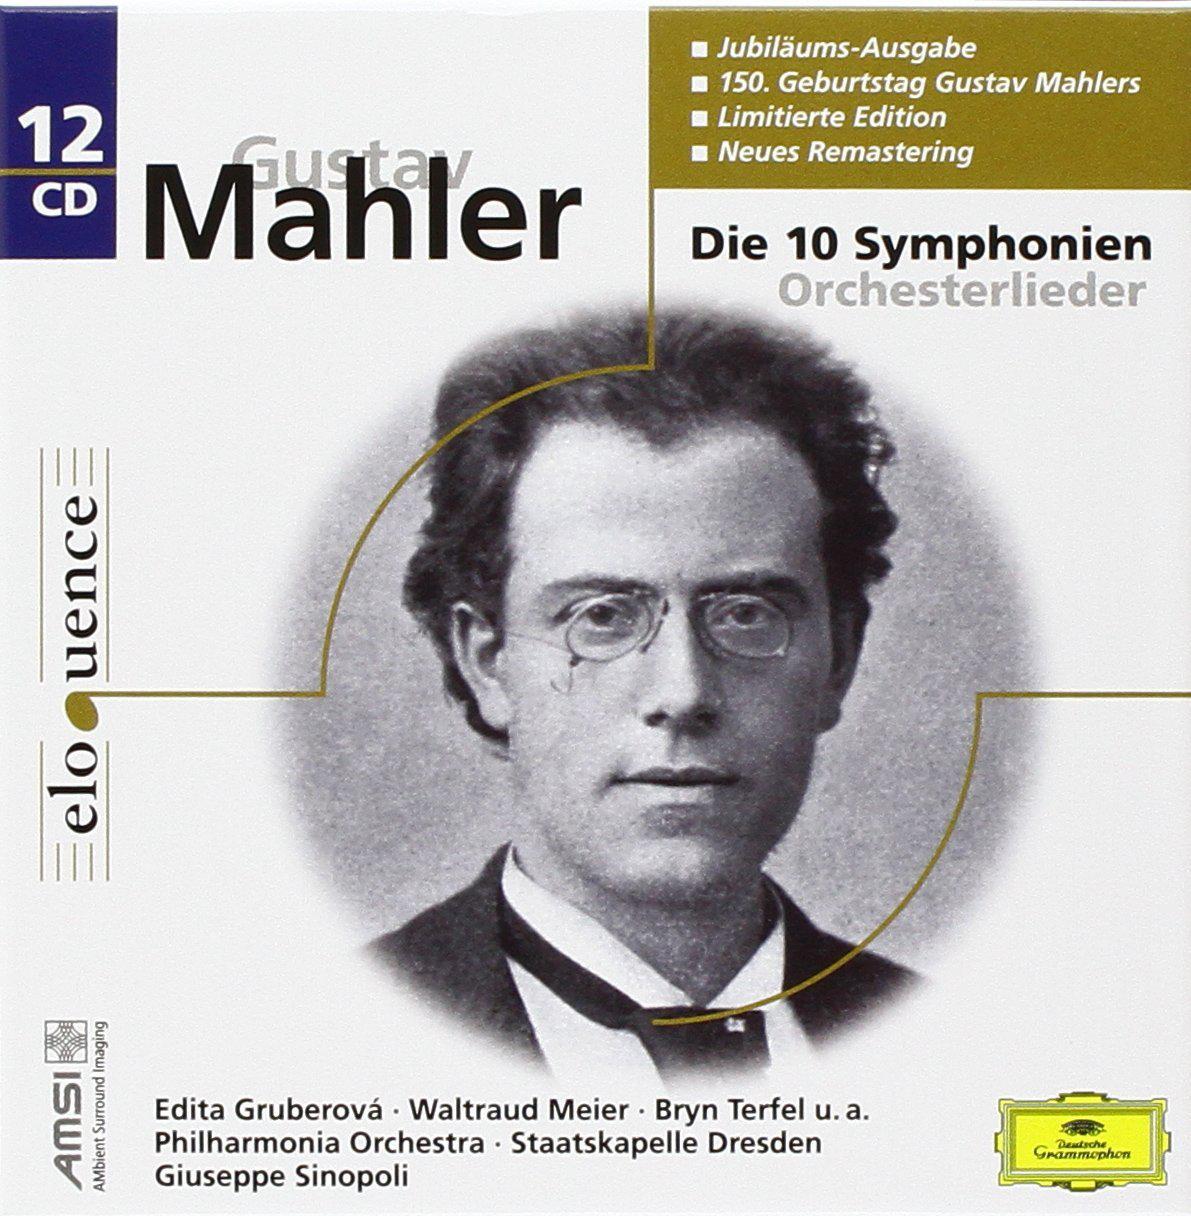 Coffret 12 CD Mahler : les 10 Symphonies